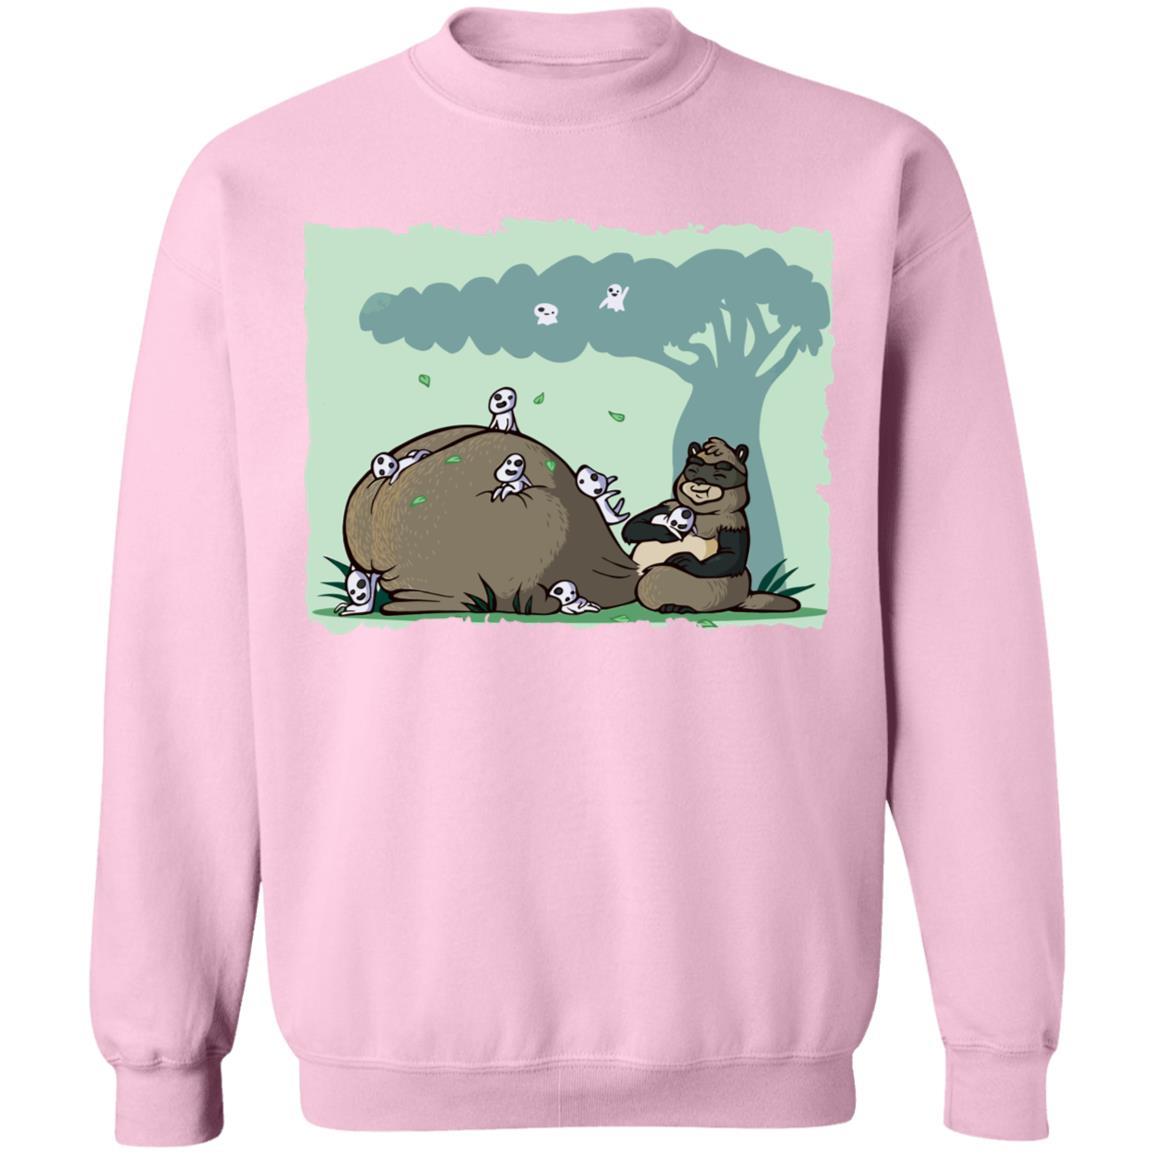 Pom Poko and the Tree Spirits Sweatshirt